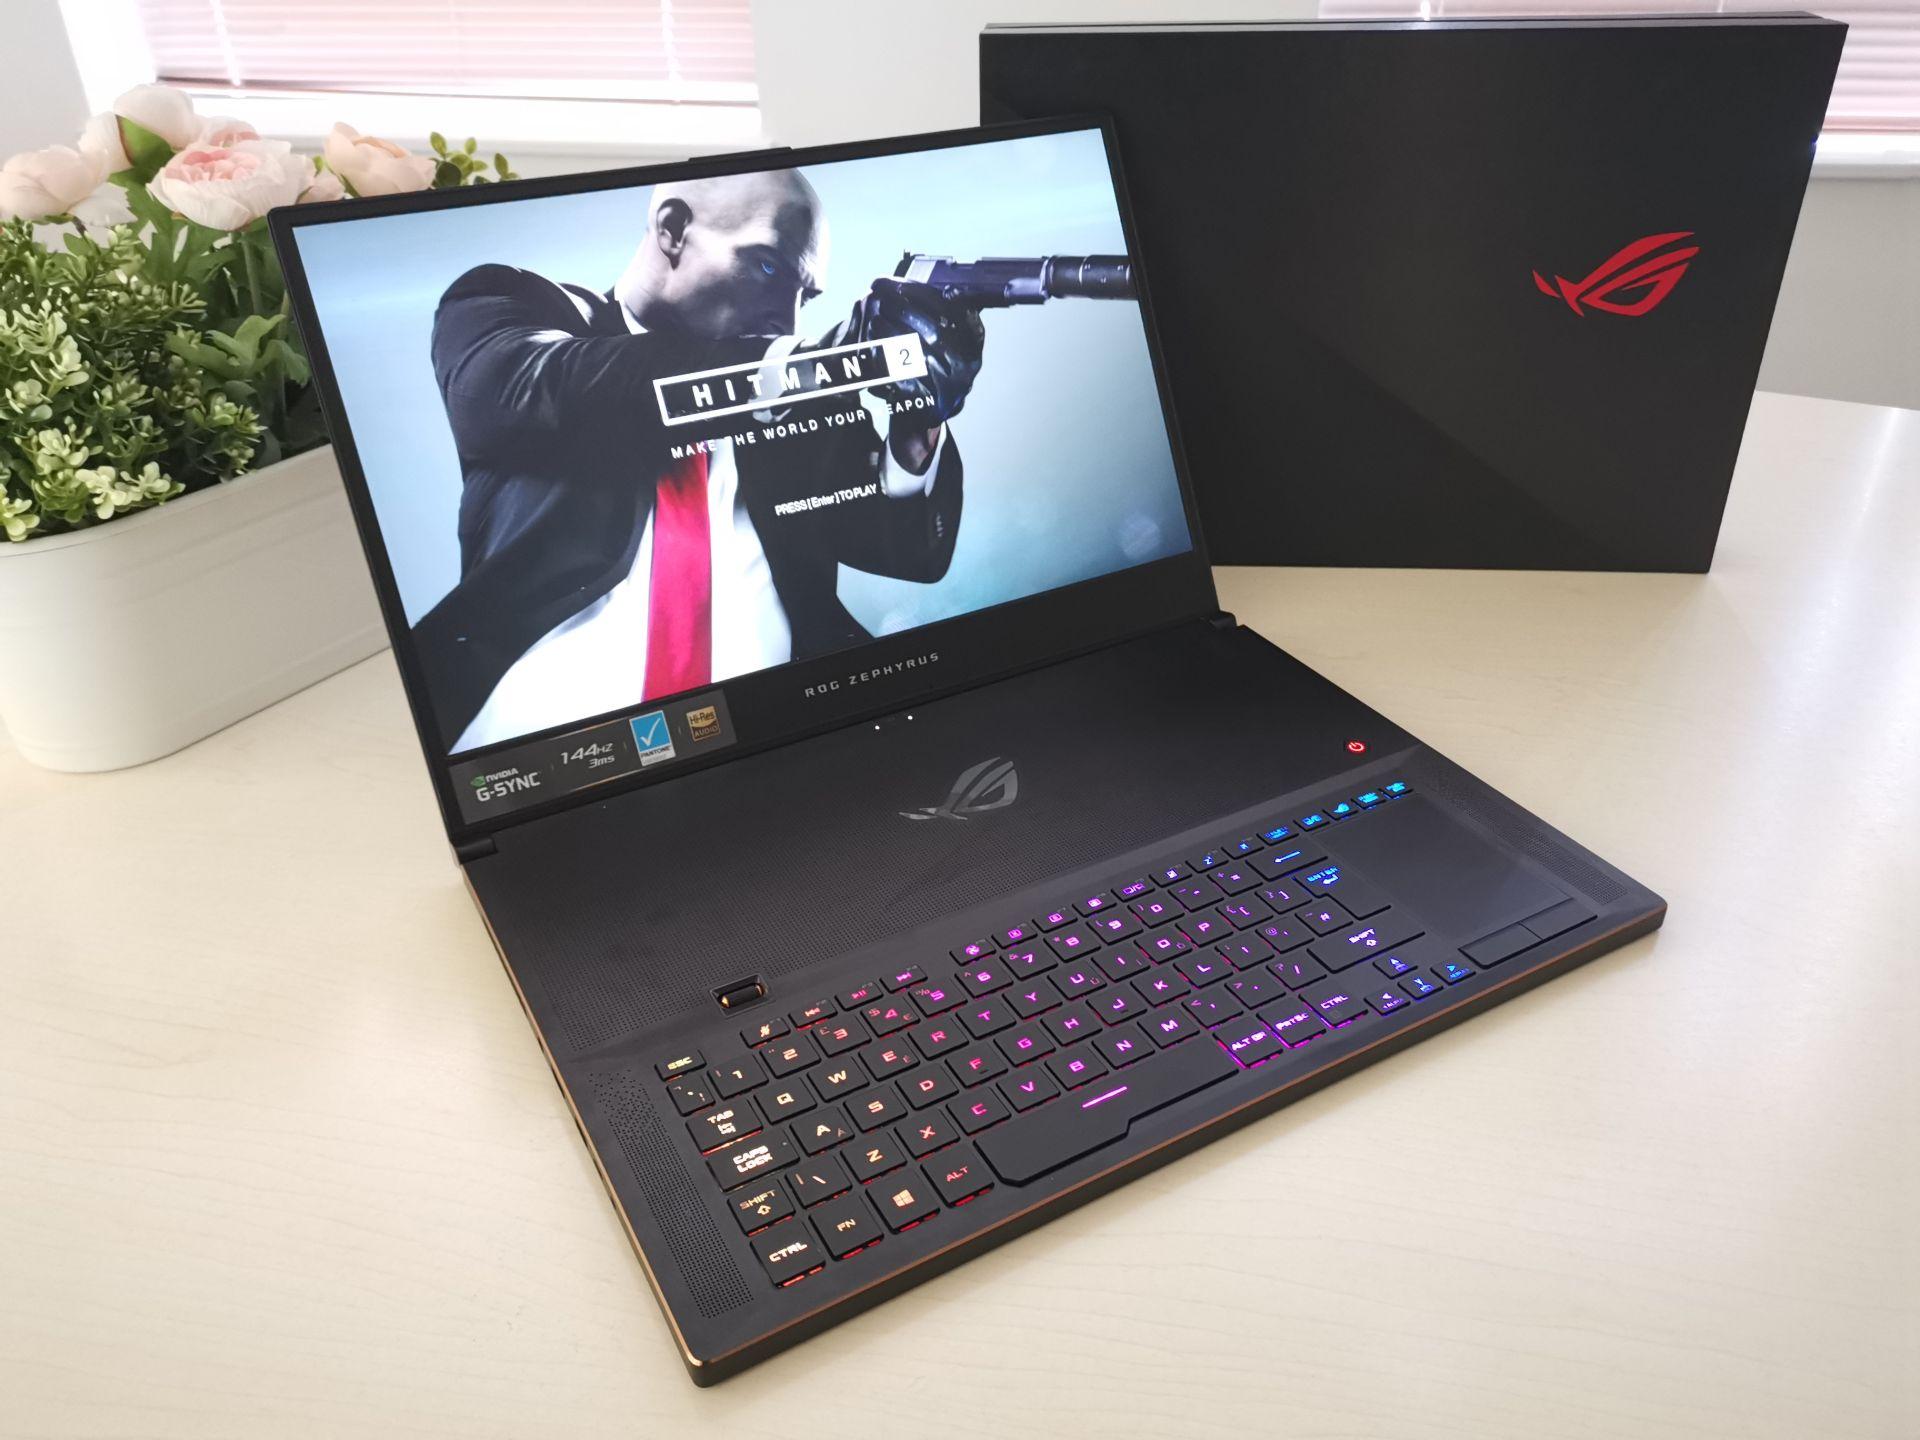 Asus ROG GX701 | Image Source T3.COM